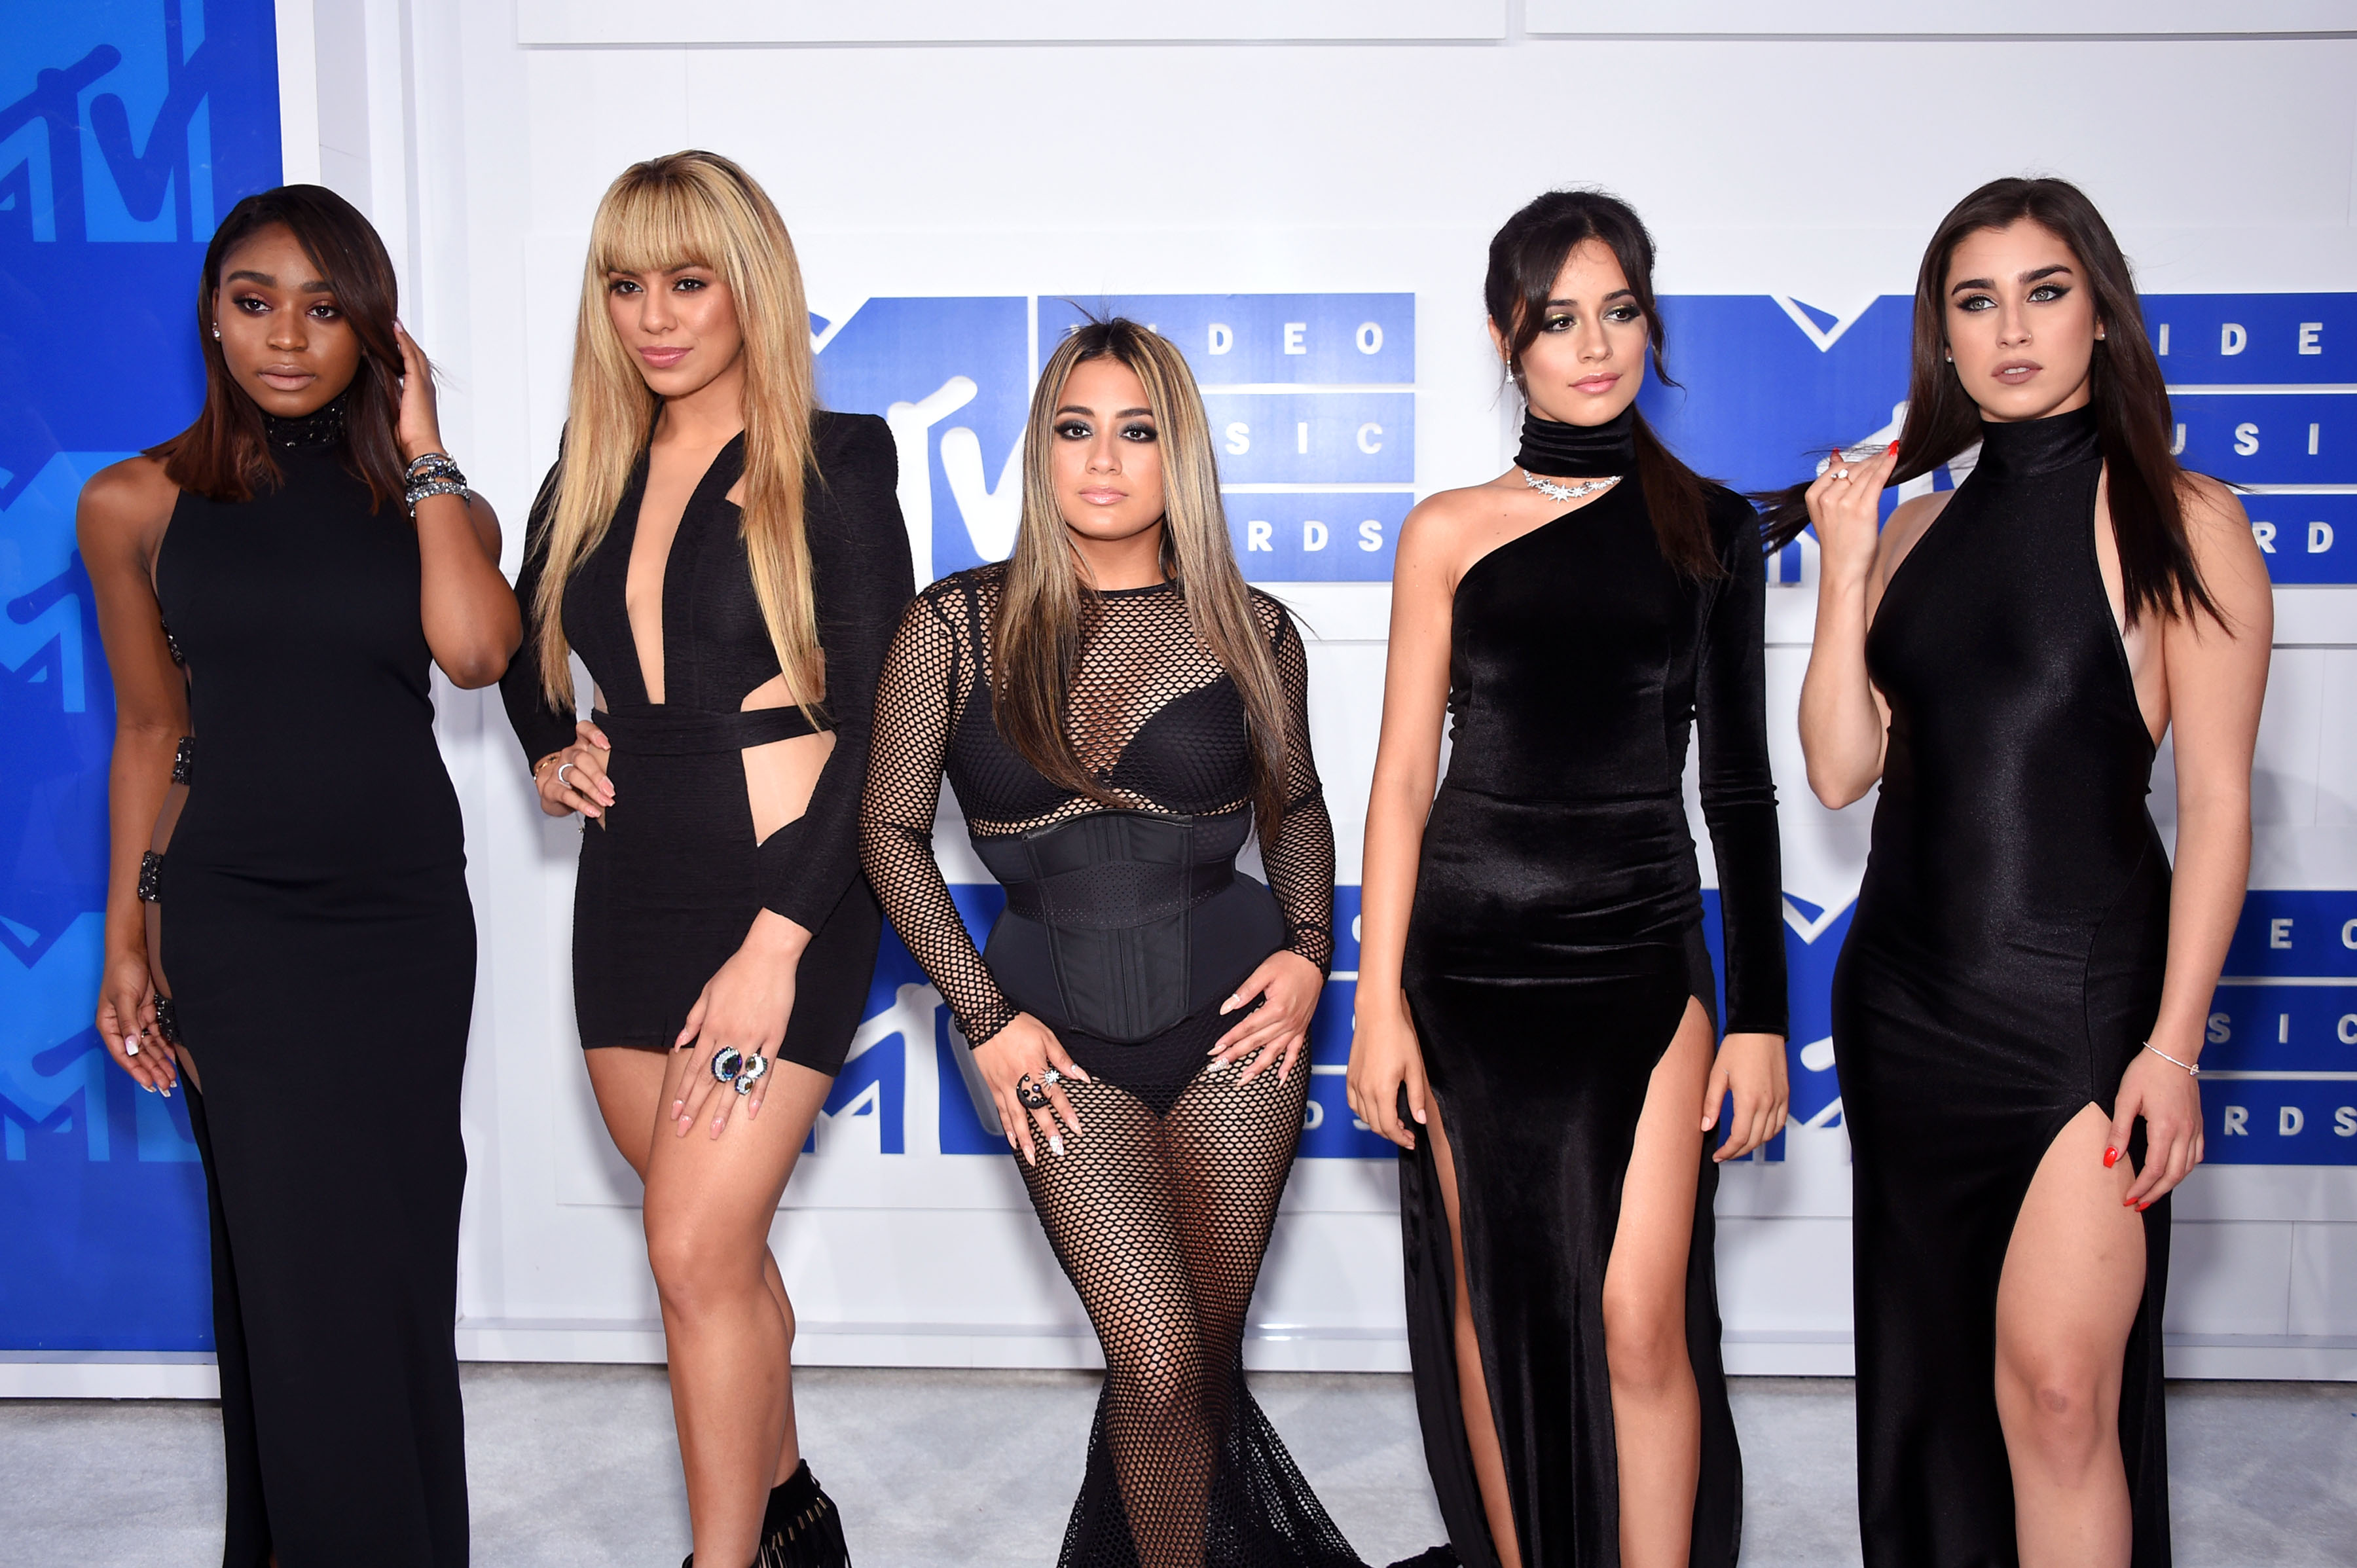 Normandi Kordei, Dinah Jane Hansen, Ally Brooke, Camila Cabello and Lauren Jauregui of Fifth Harmony attend the 2016 MTV Video Music Awards at Madison Square Garden.